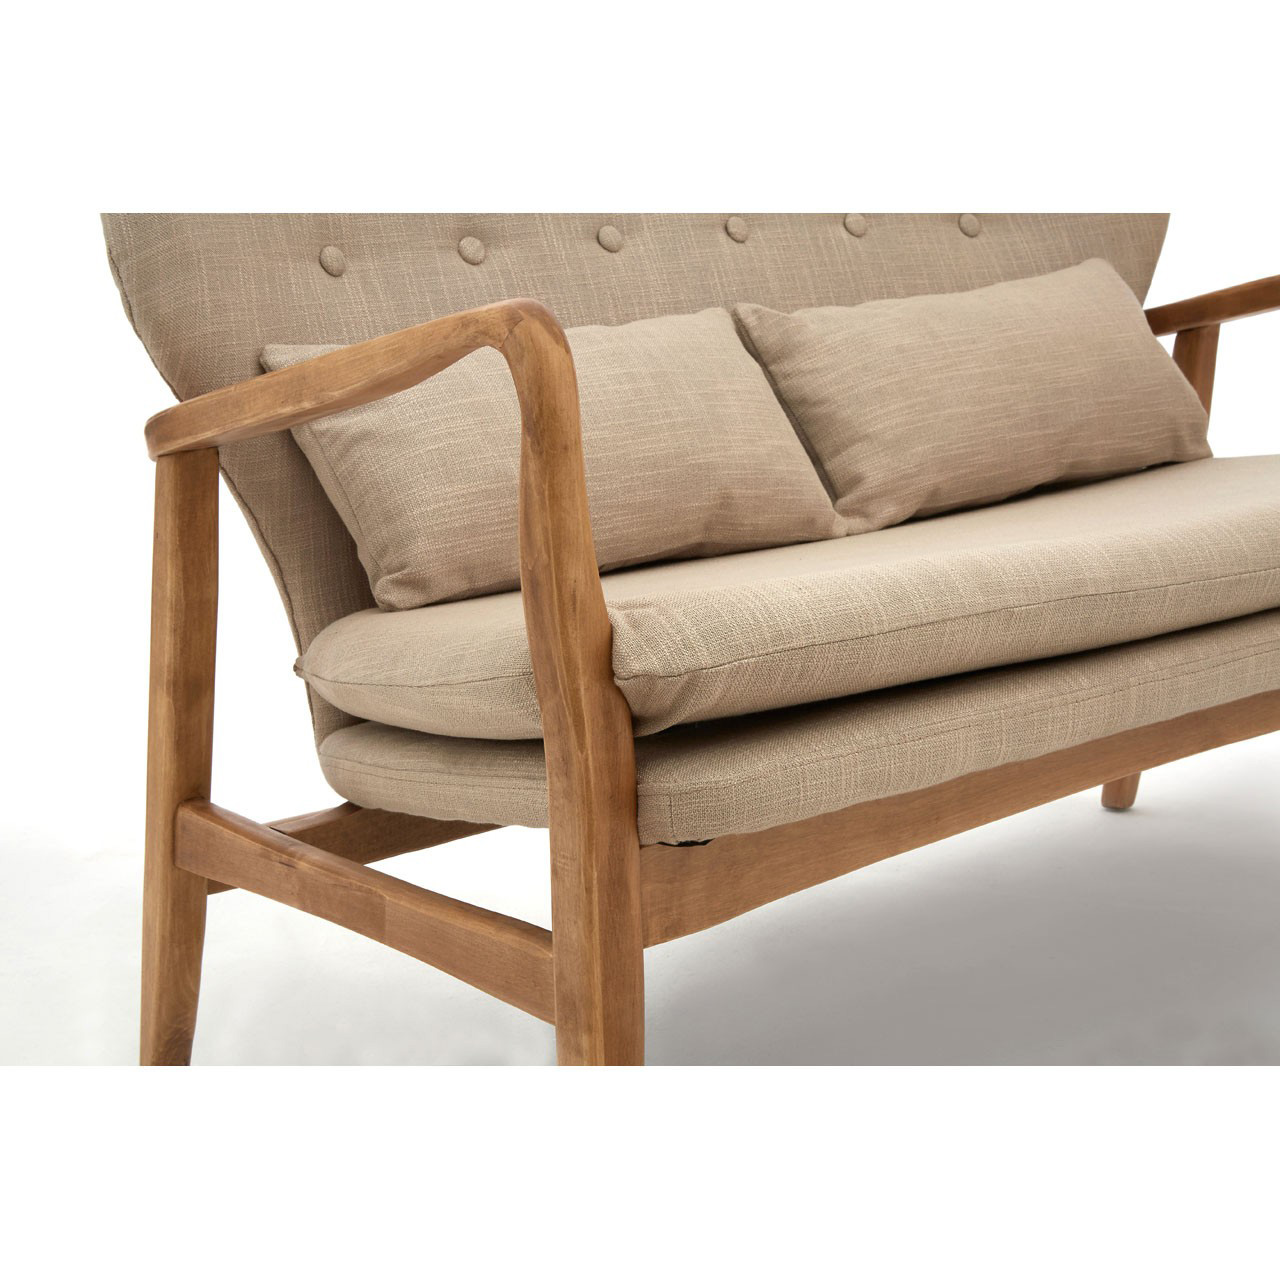 oatmeal sofa maier 2 pc laf sectional oslo seater scandi style fads co uk